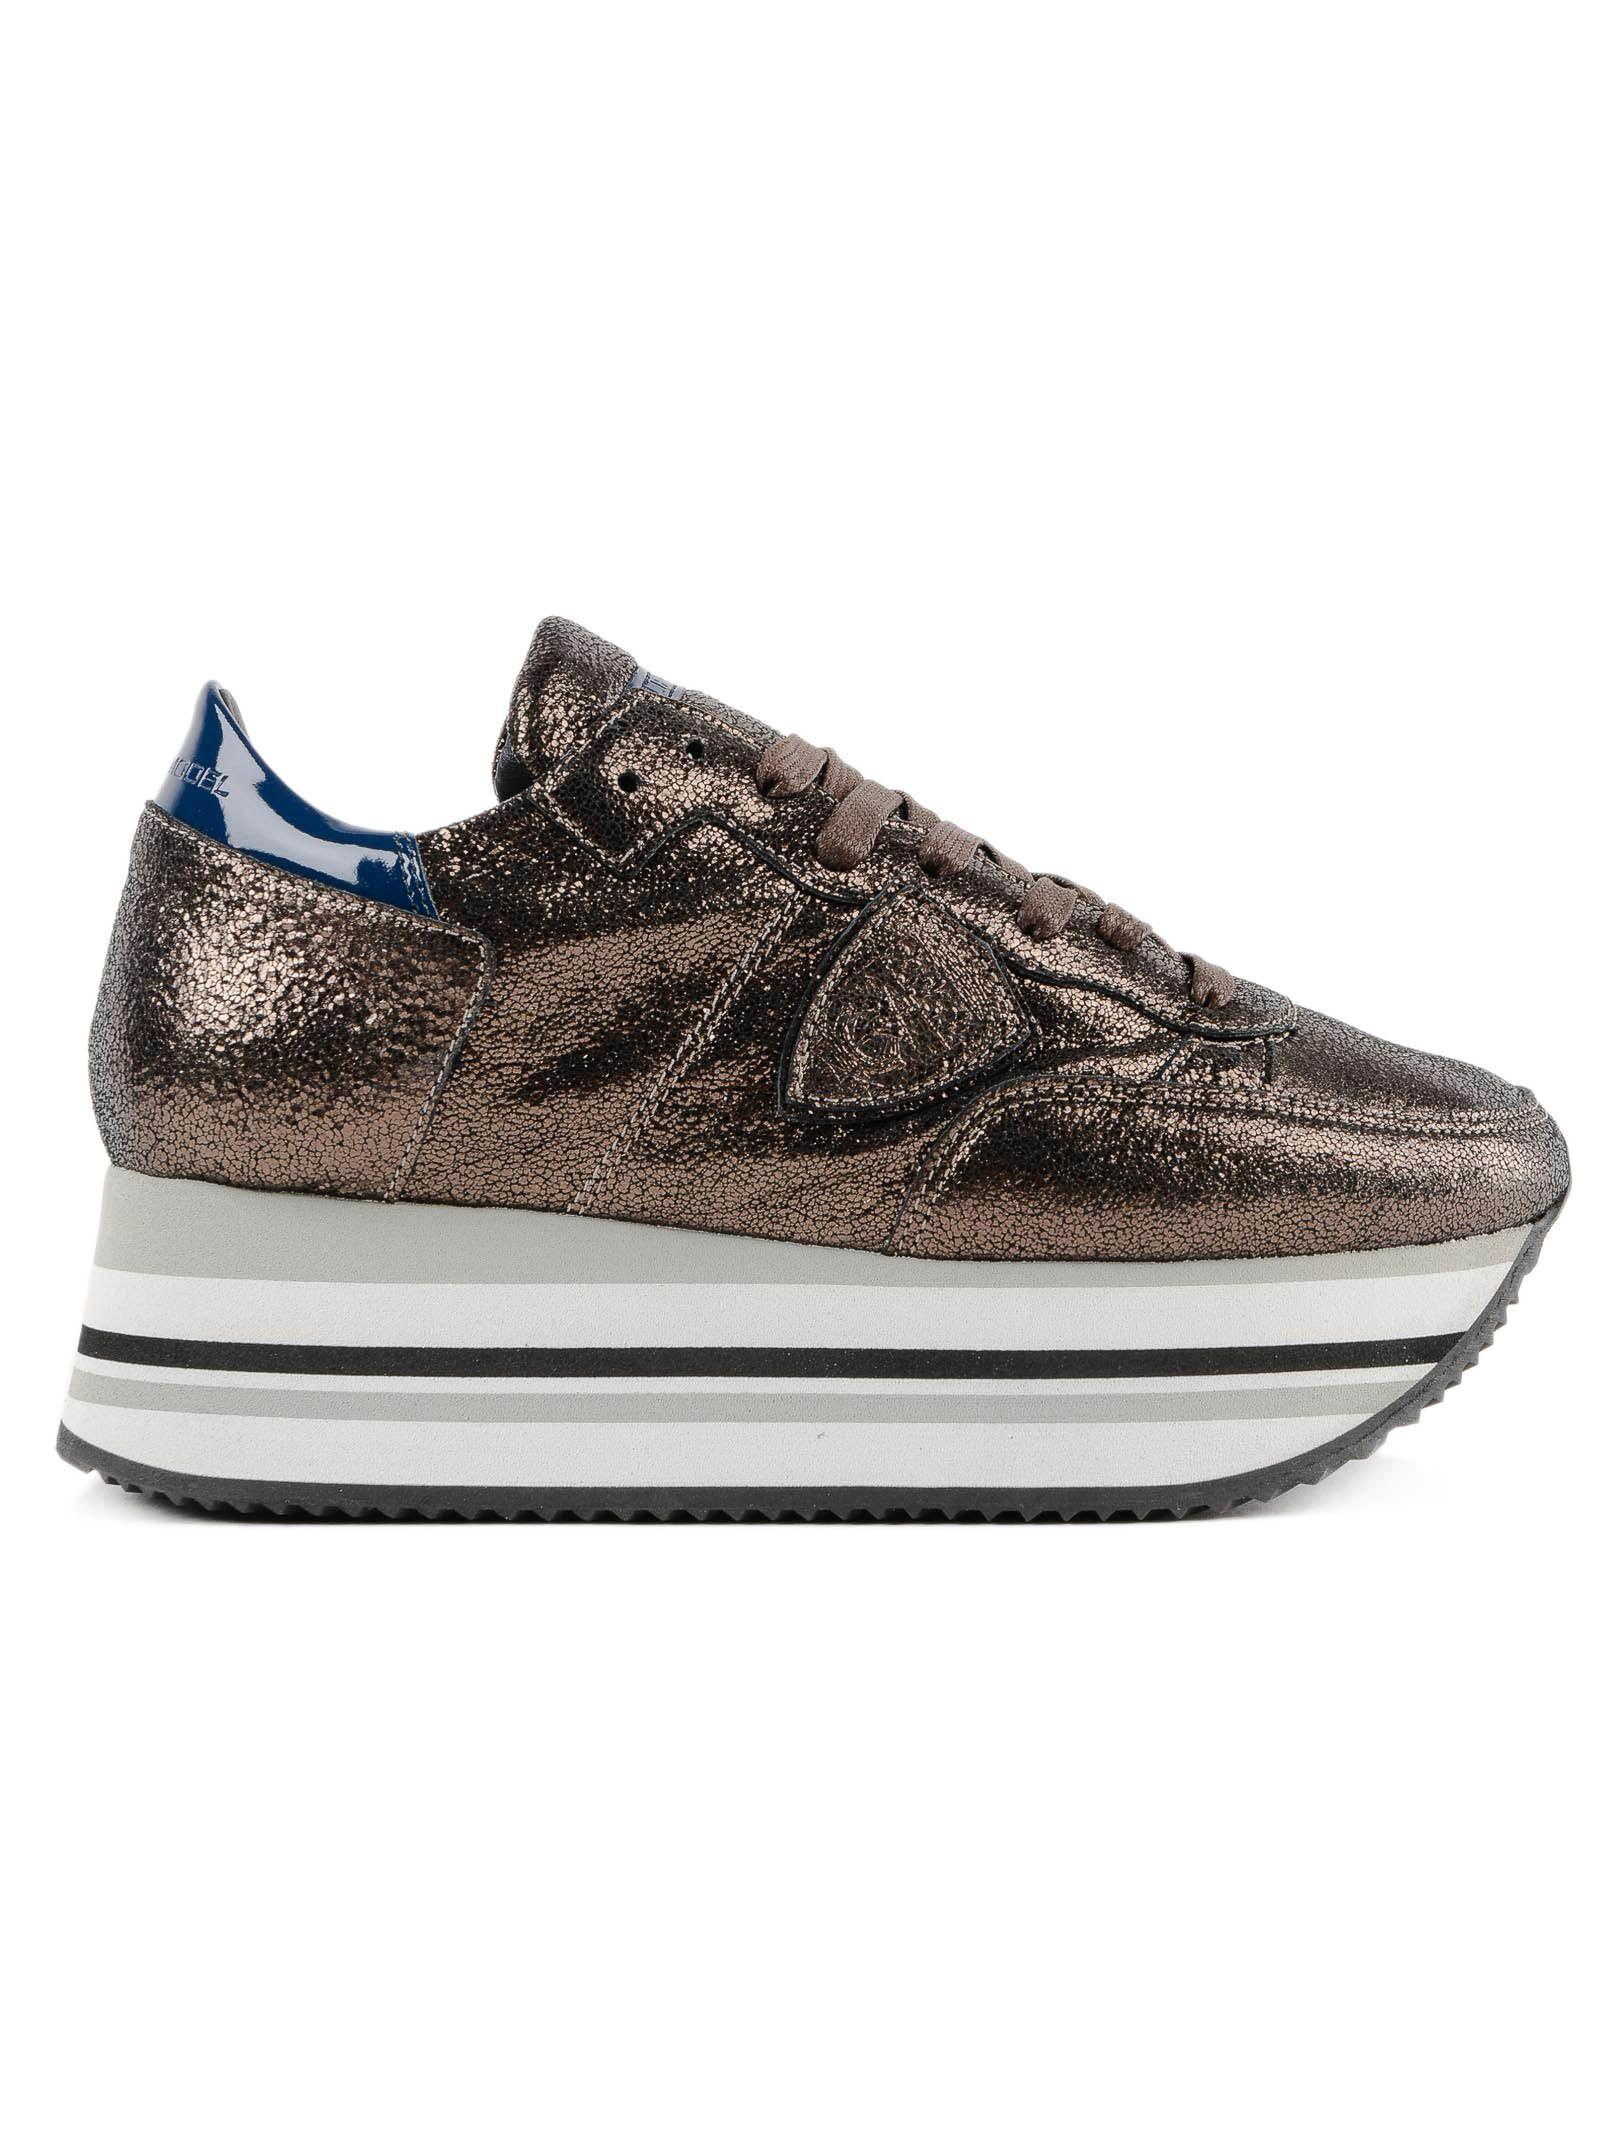 Philippe Model Glitter Platform Sneakers